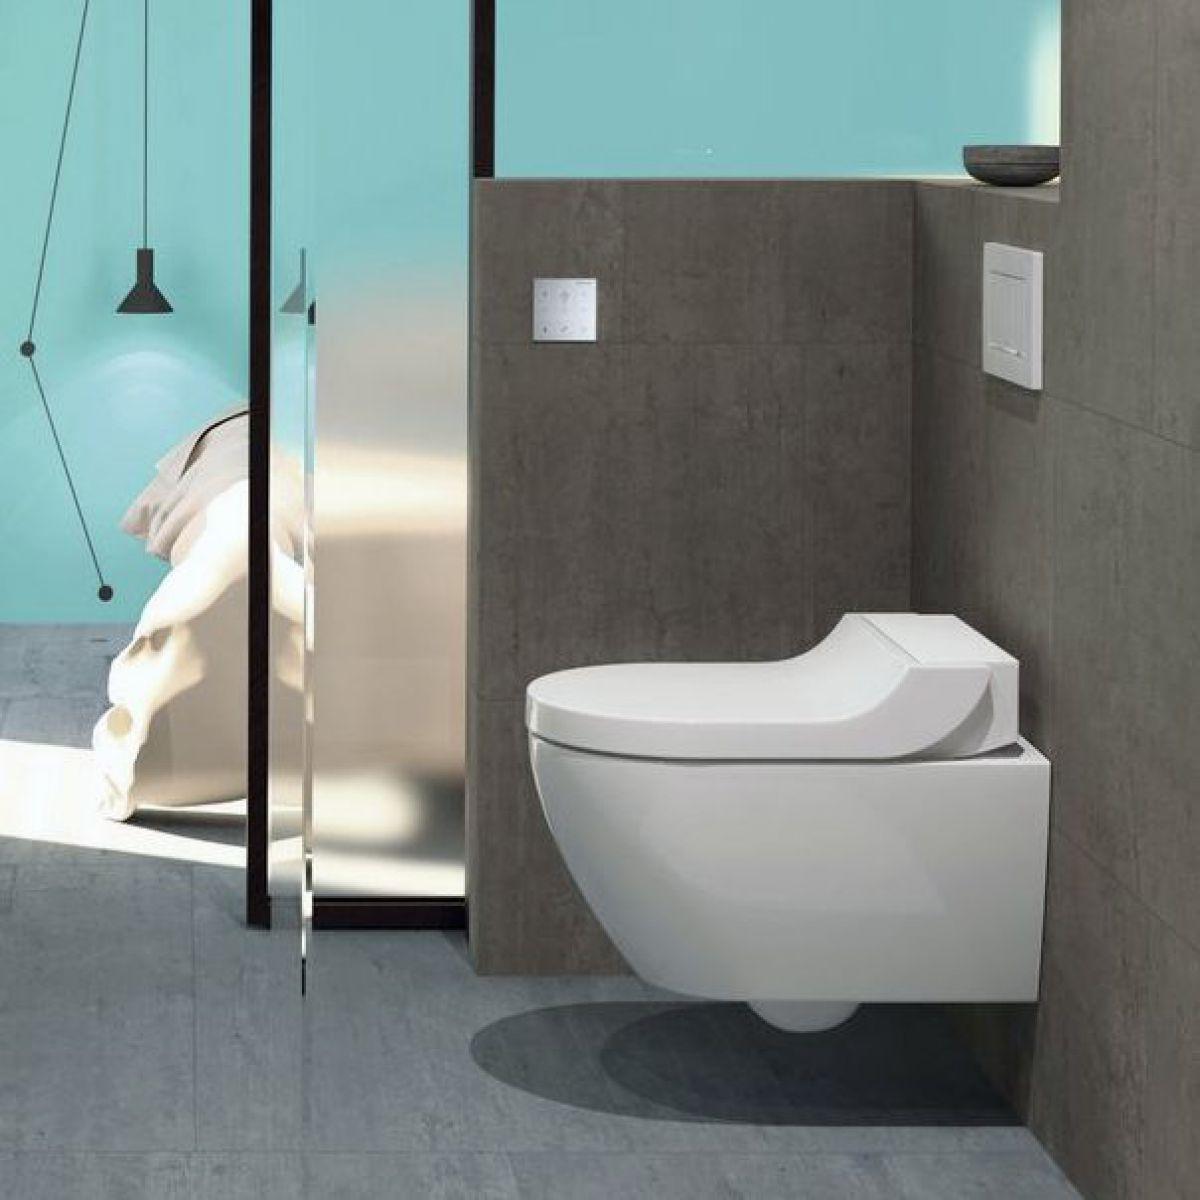 Geberit Aquaclean Tuma Rimless Wall Hung Shower Toilet